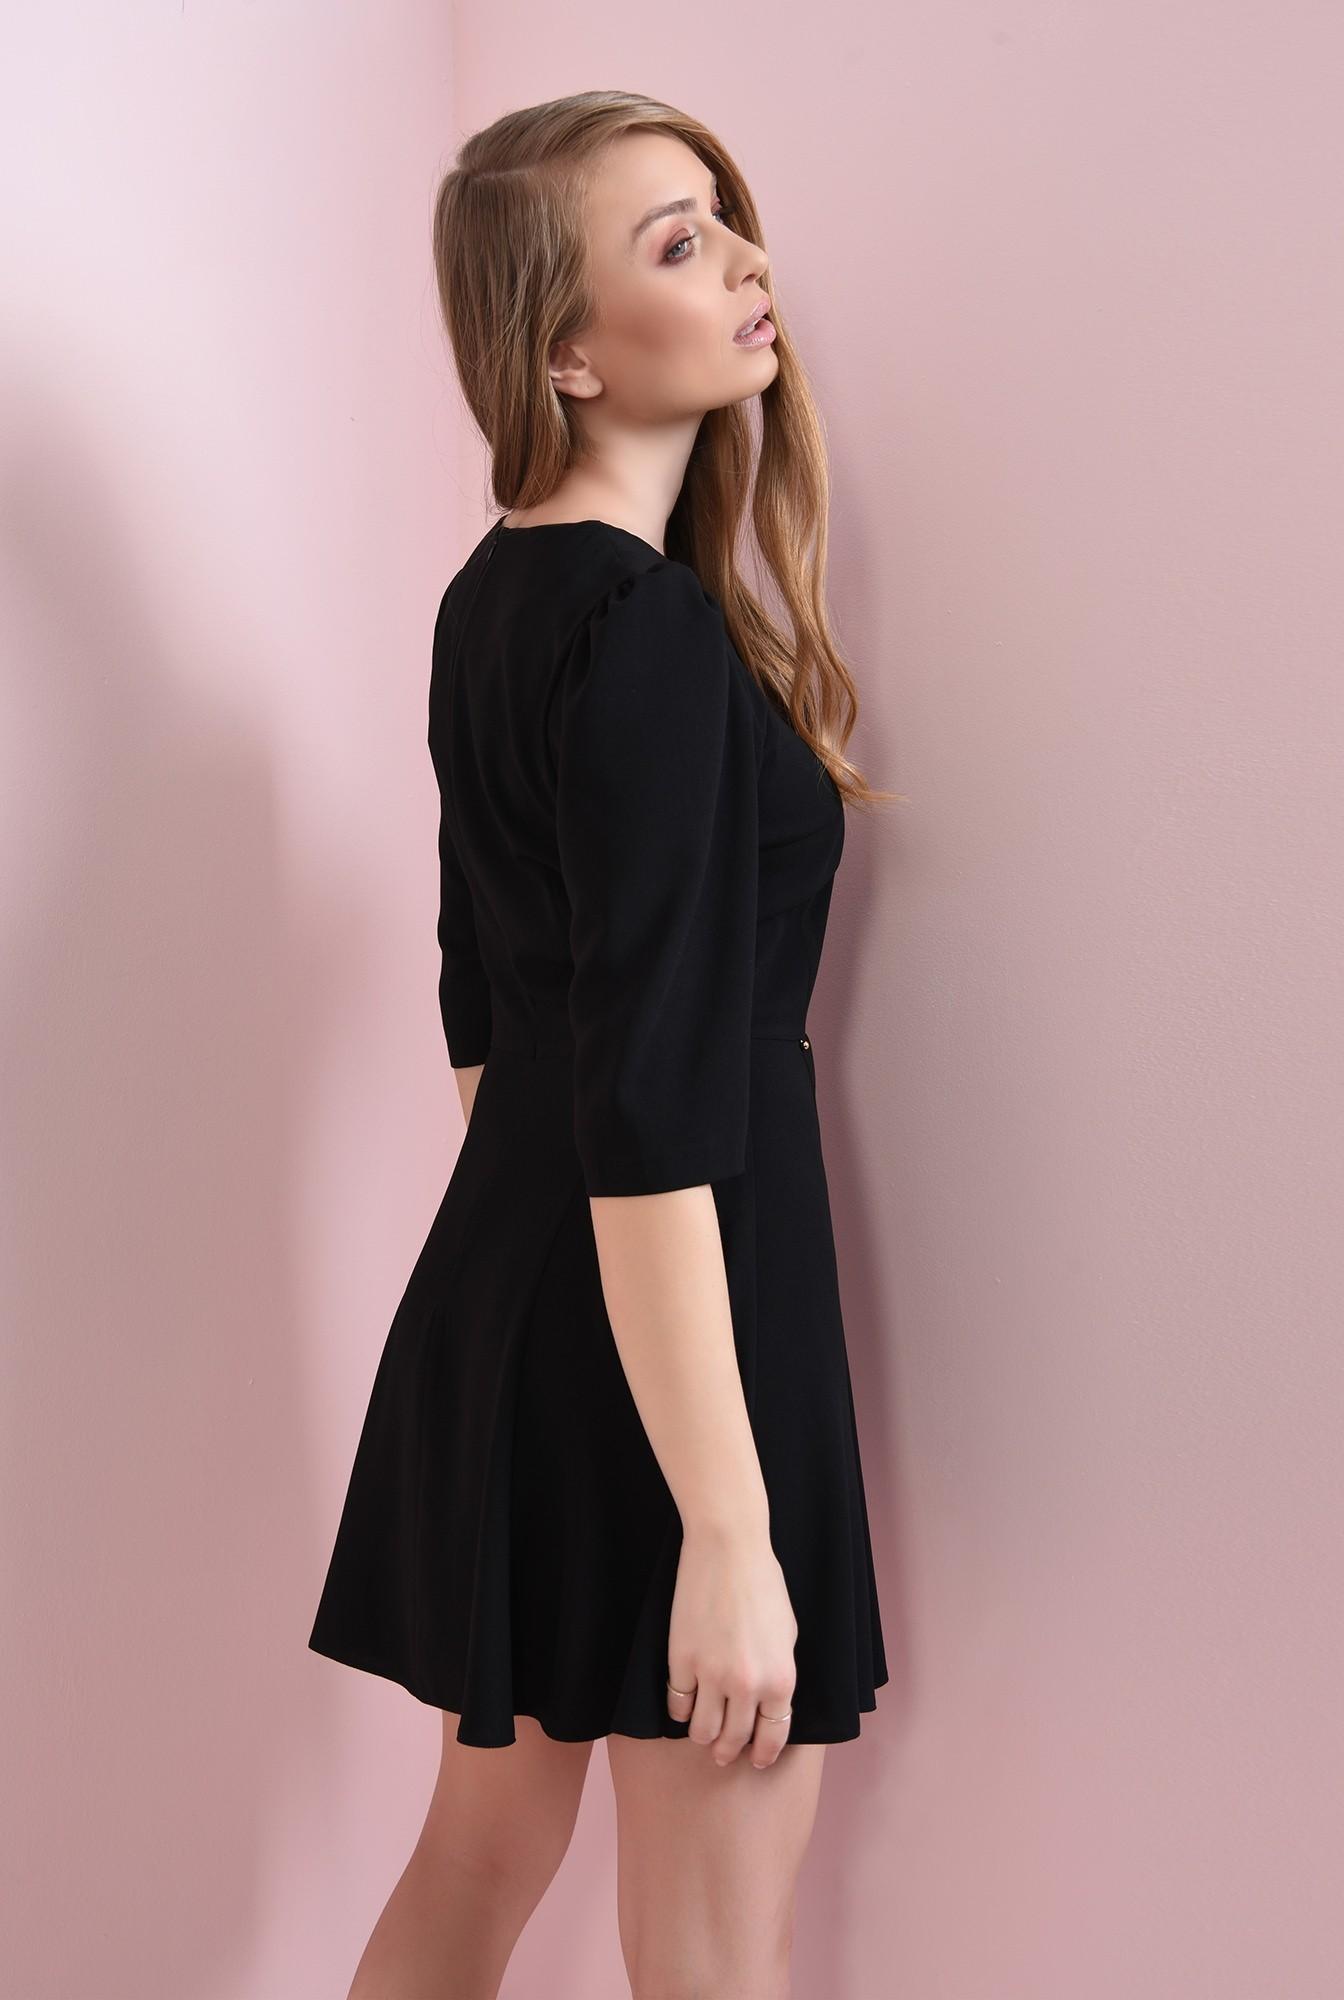 2 - rochie casual, neagra, evazata